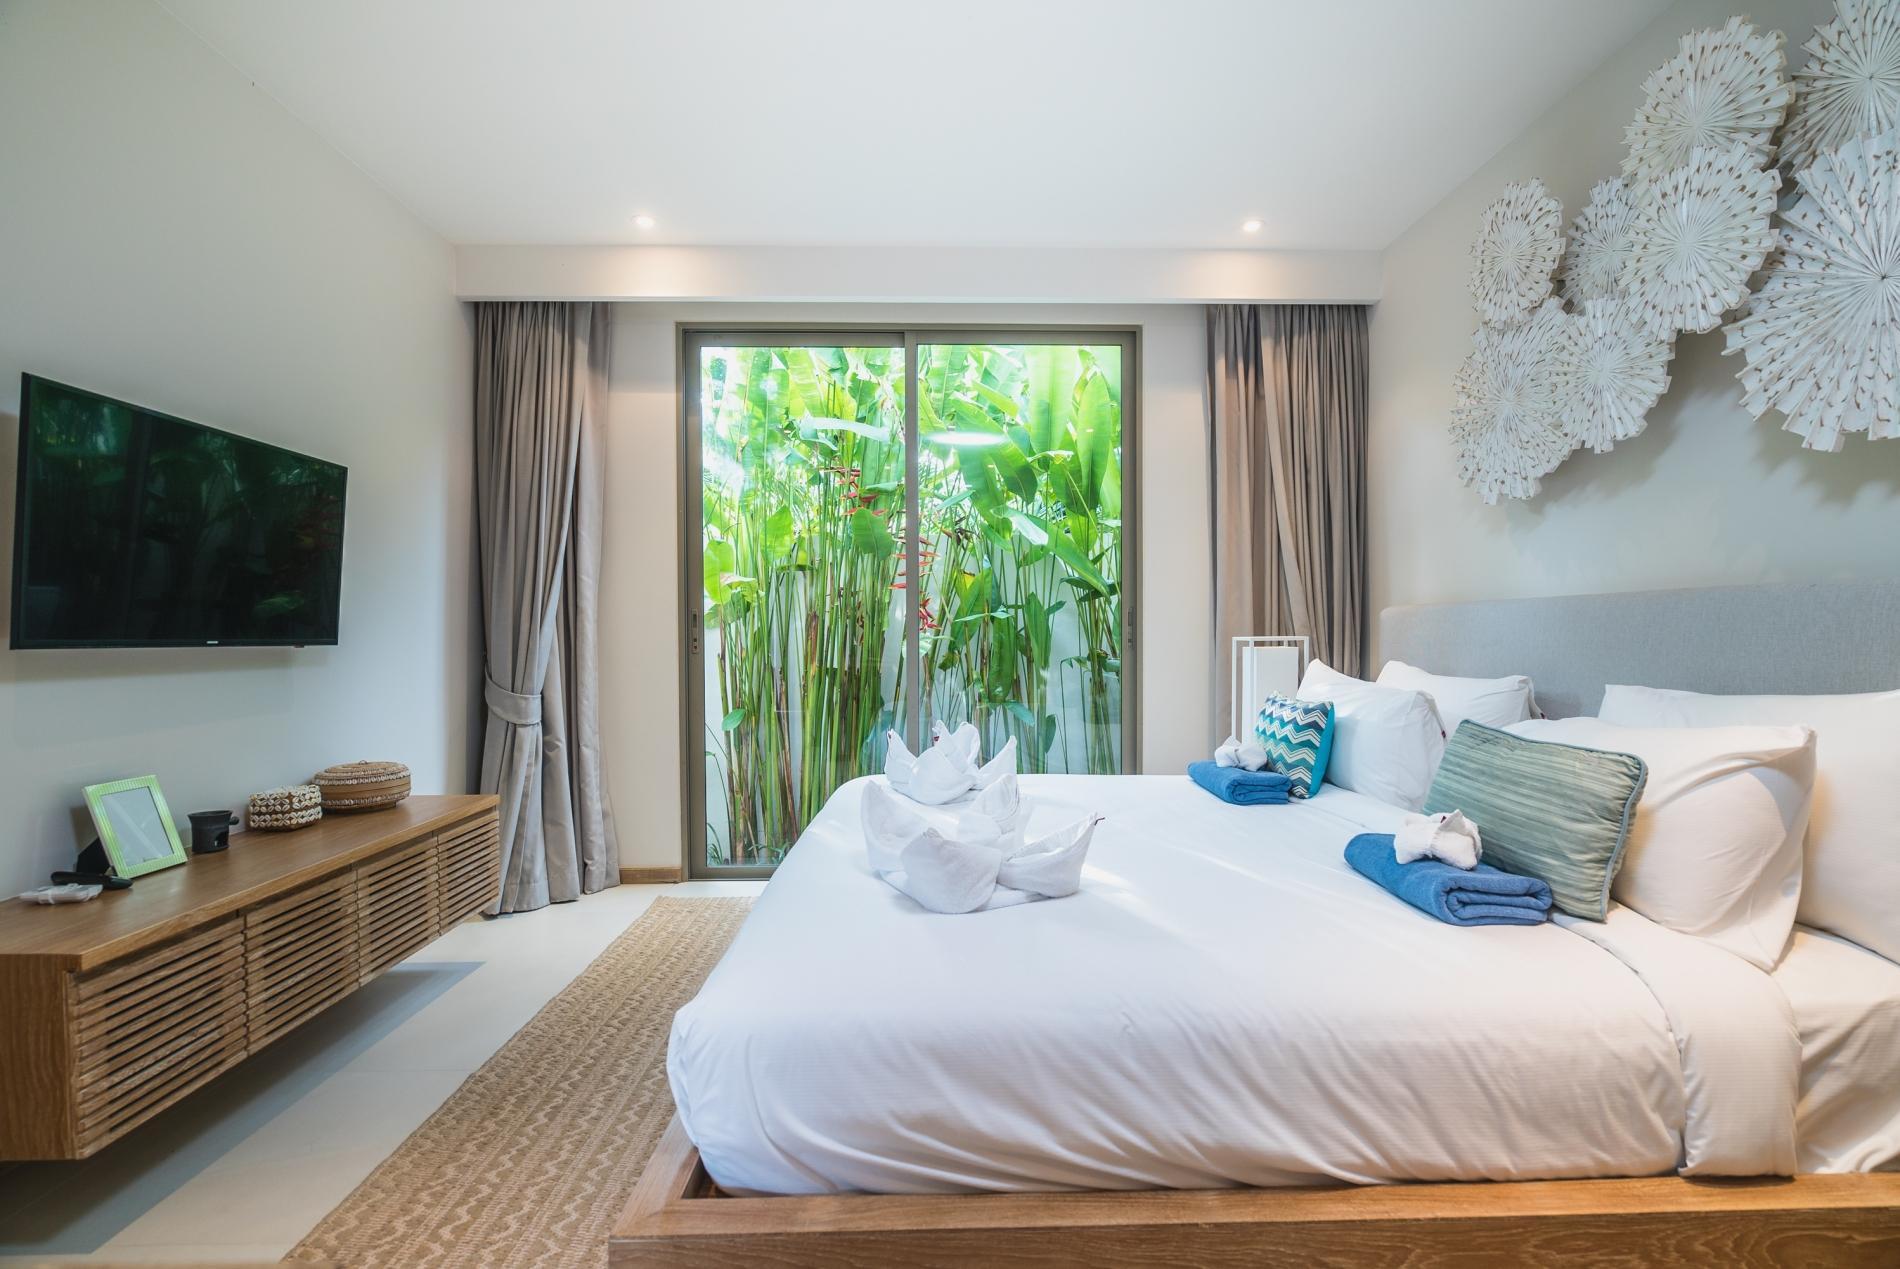 Apartment Trichada 18 - Private pool modern 3 bedroom villa photo 18652125